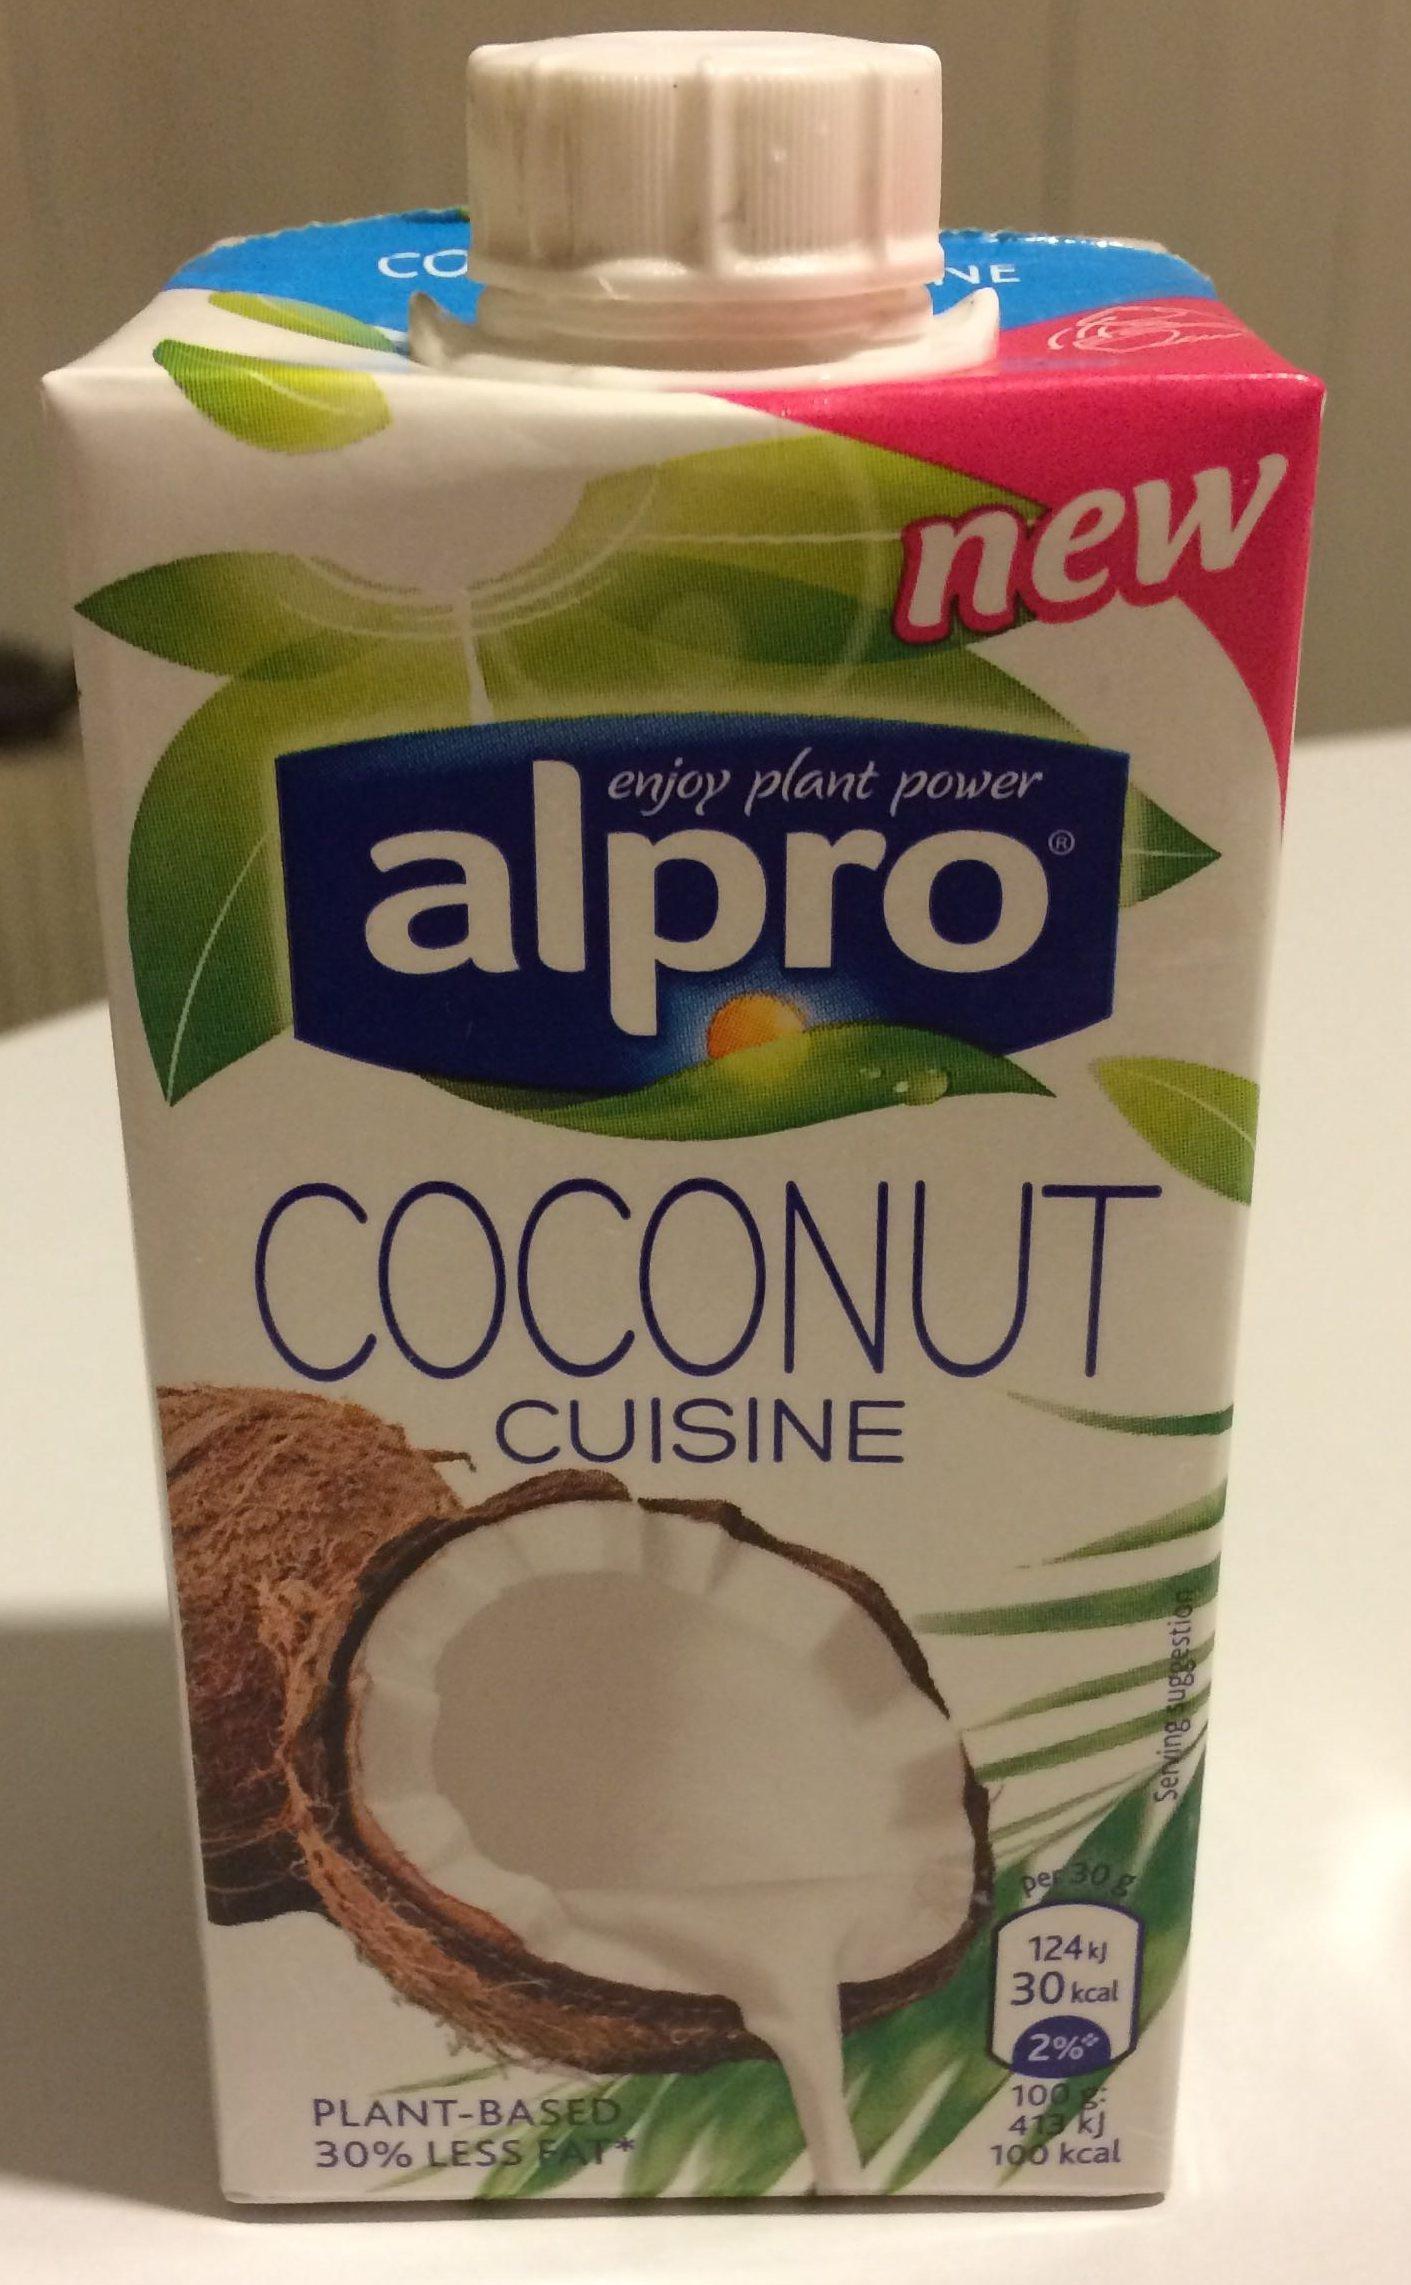 Coconut cuisine alpro 25o ml for Alpro coconut cuisine